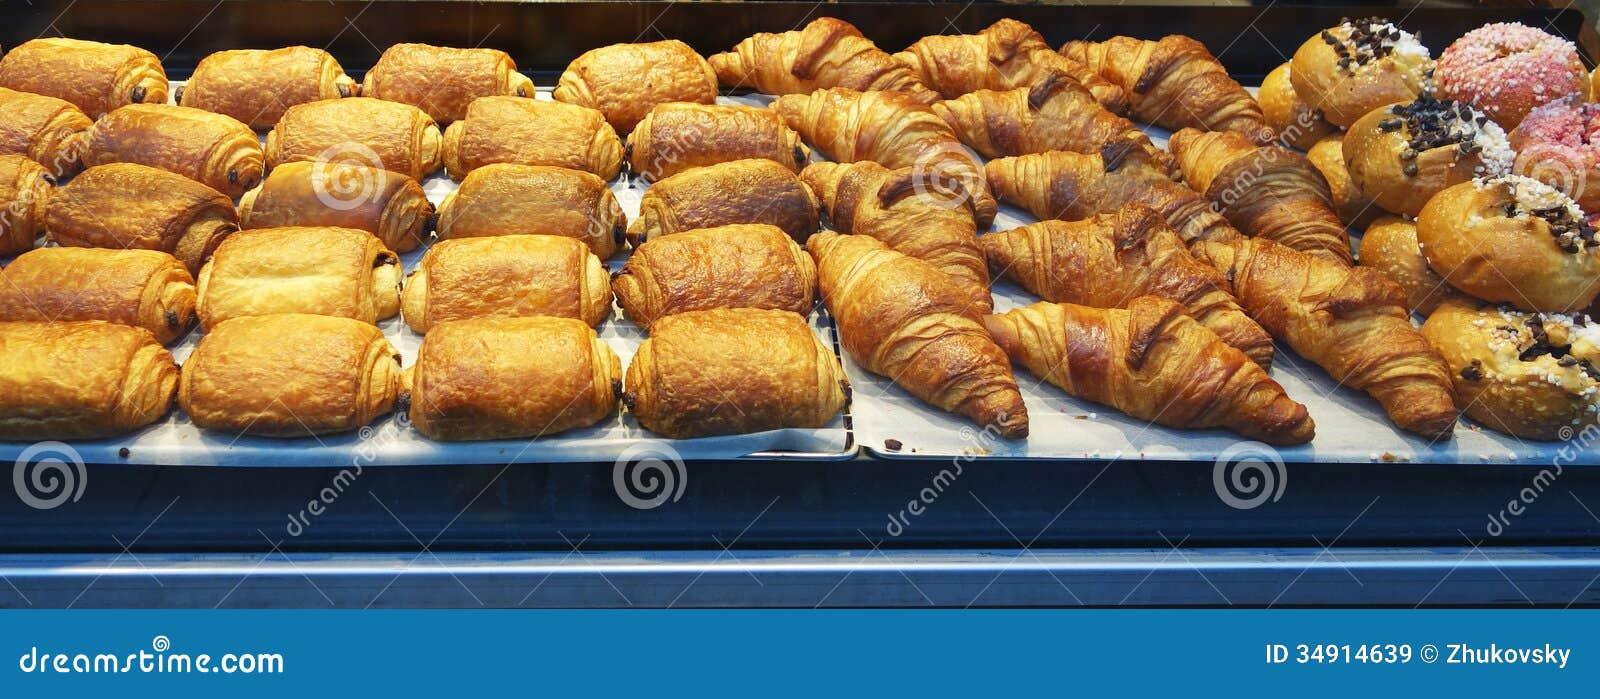 Franse gebakjes op vertoning